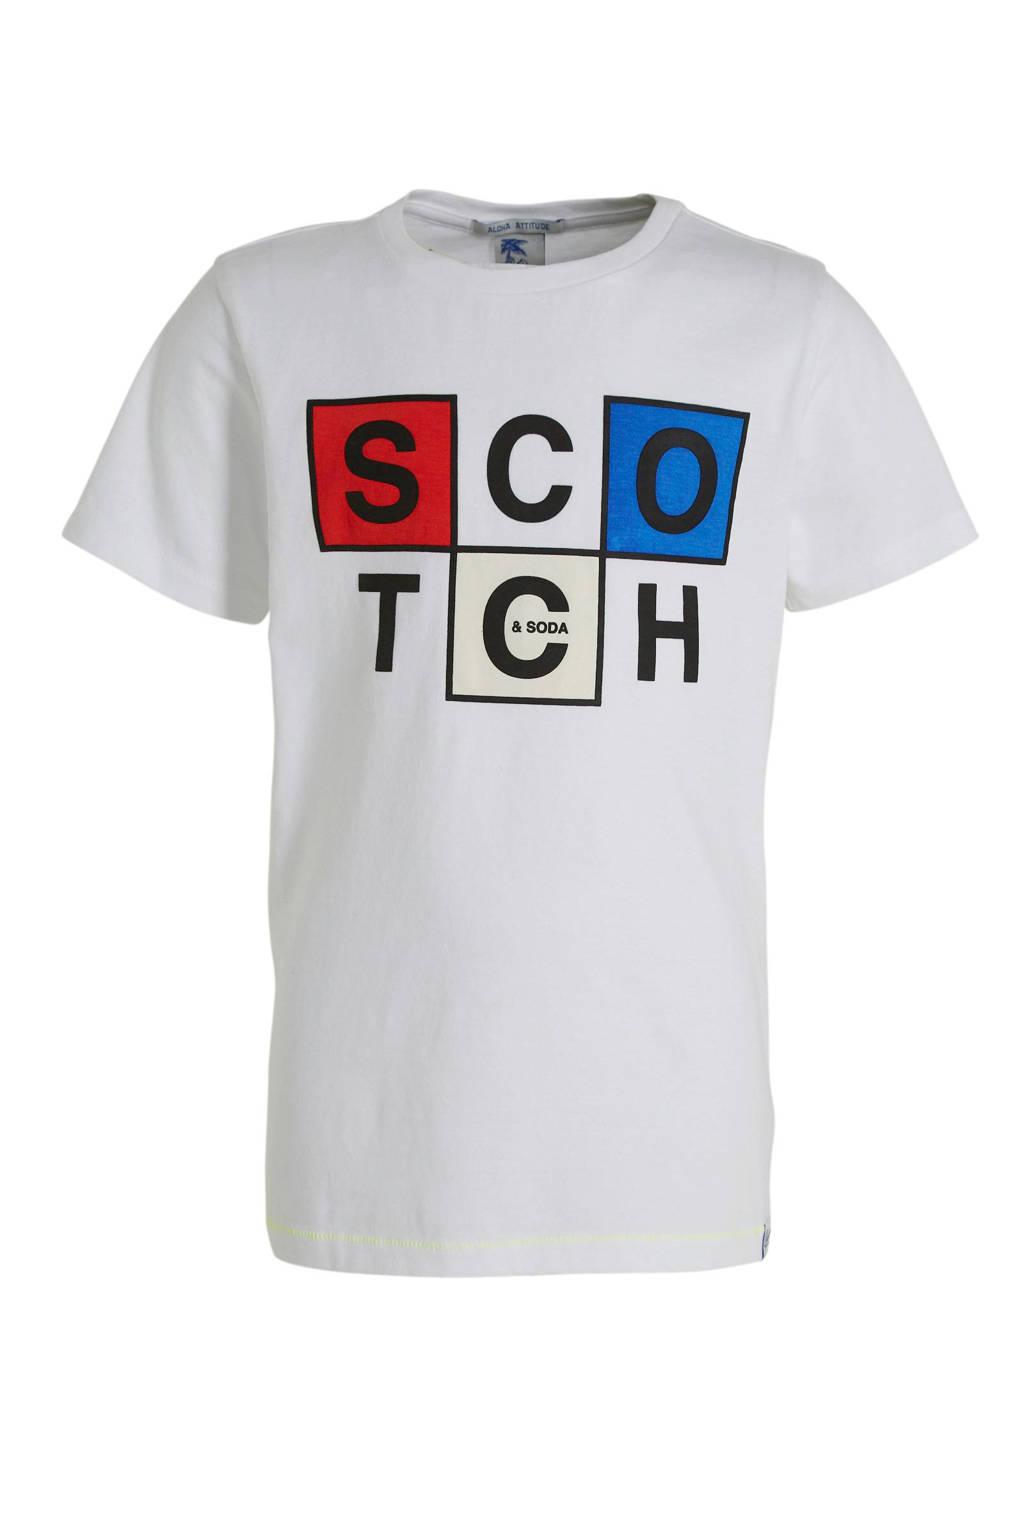 Scotch & Soda T-shirt met printopdruk wit/rood/blauw, Wit/rood/blauw